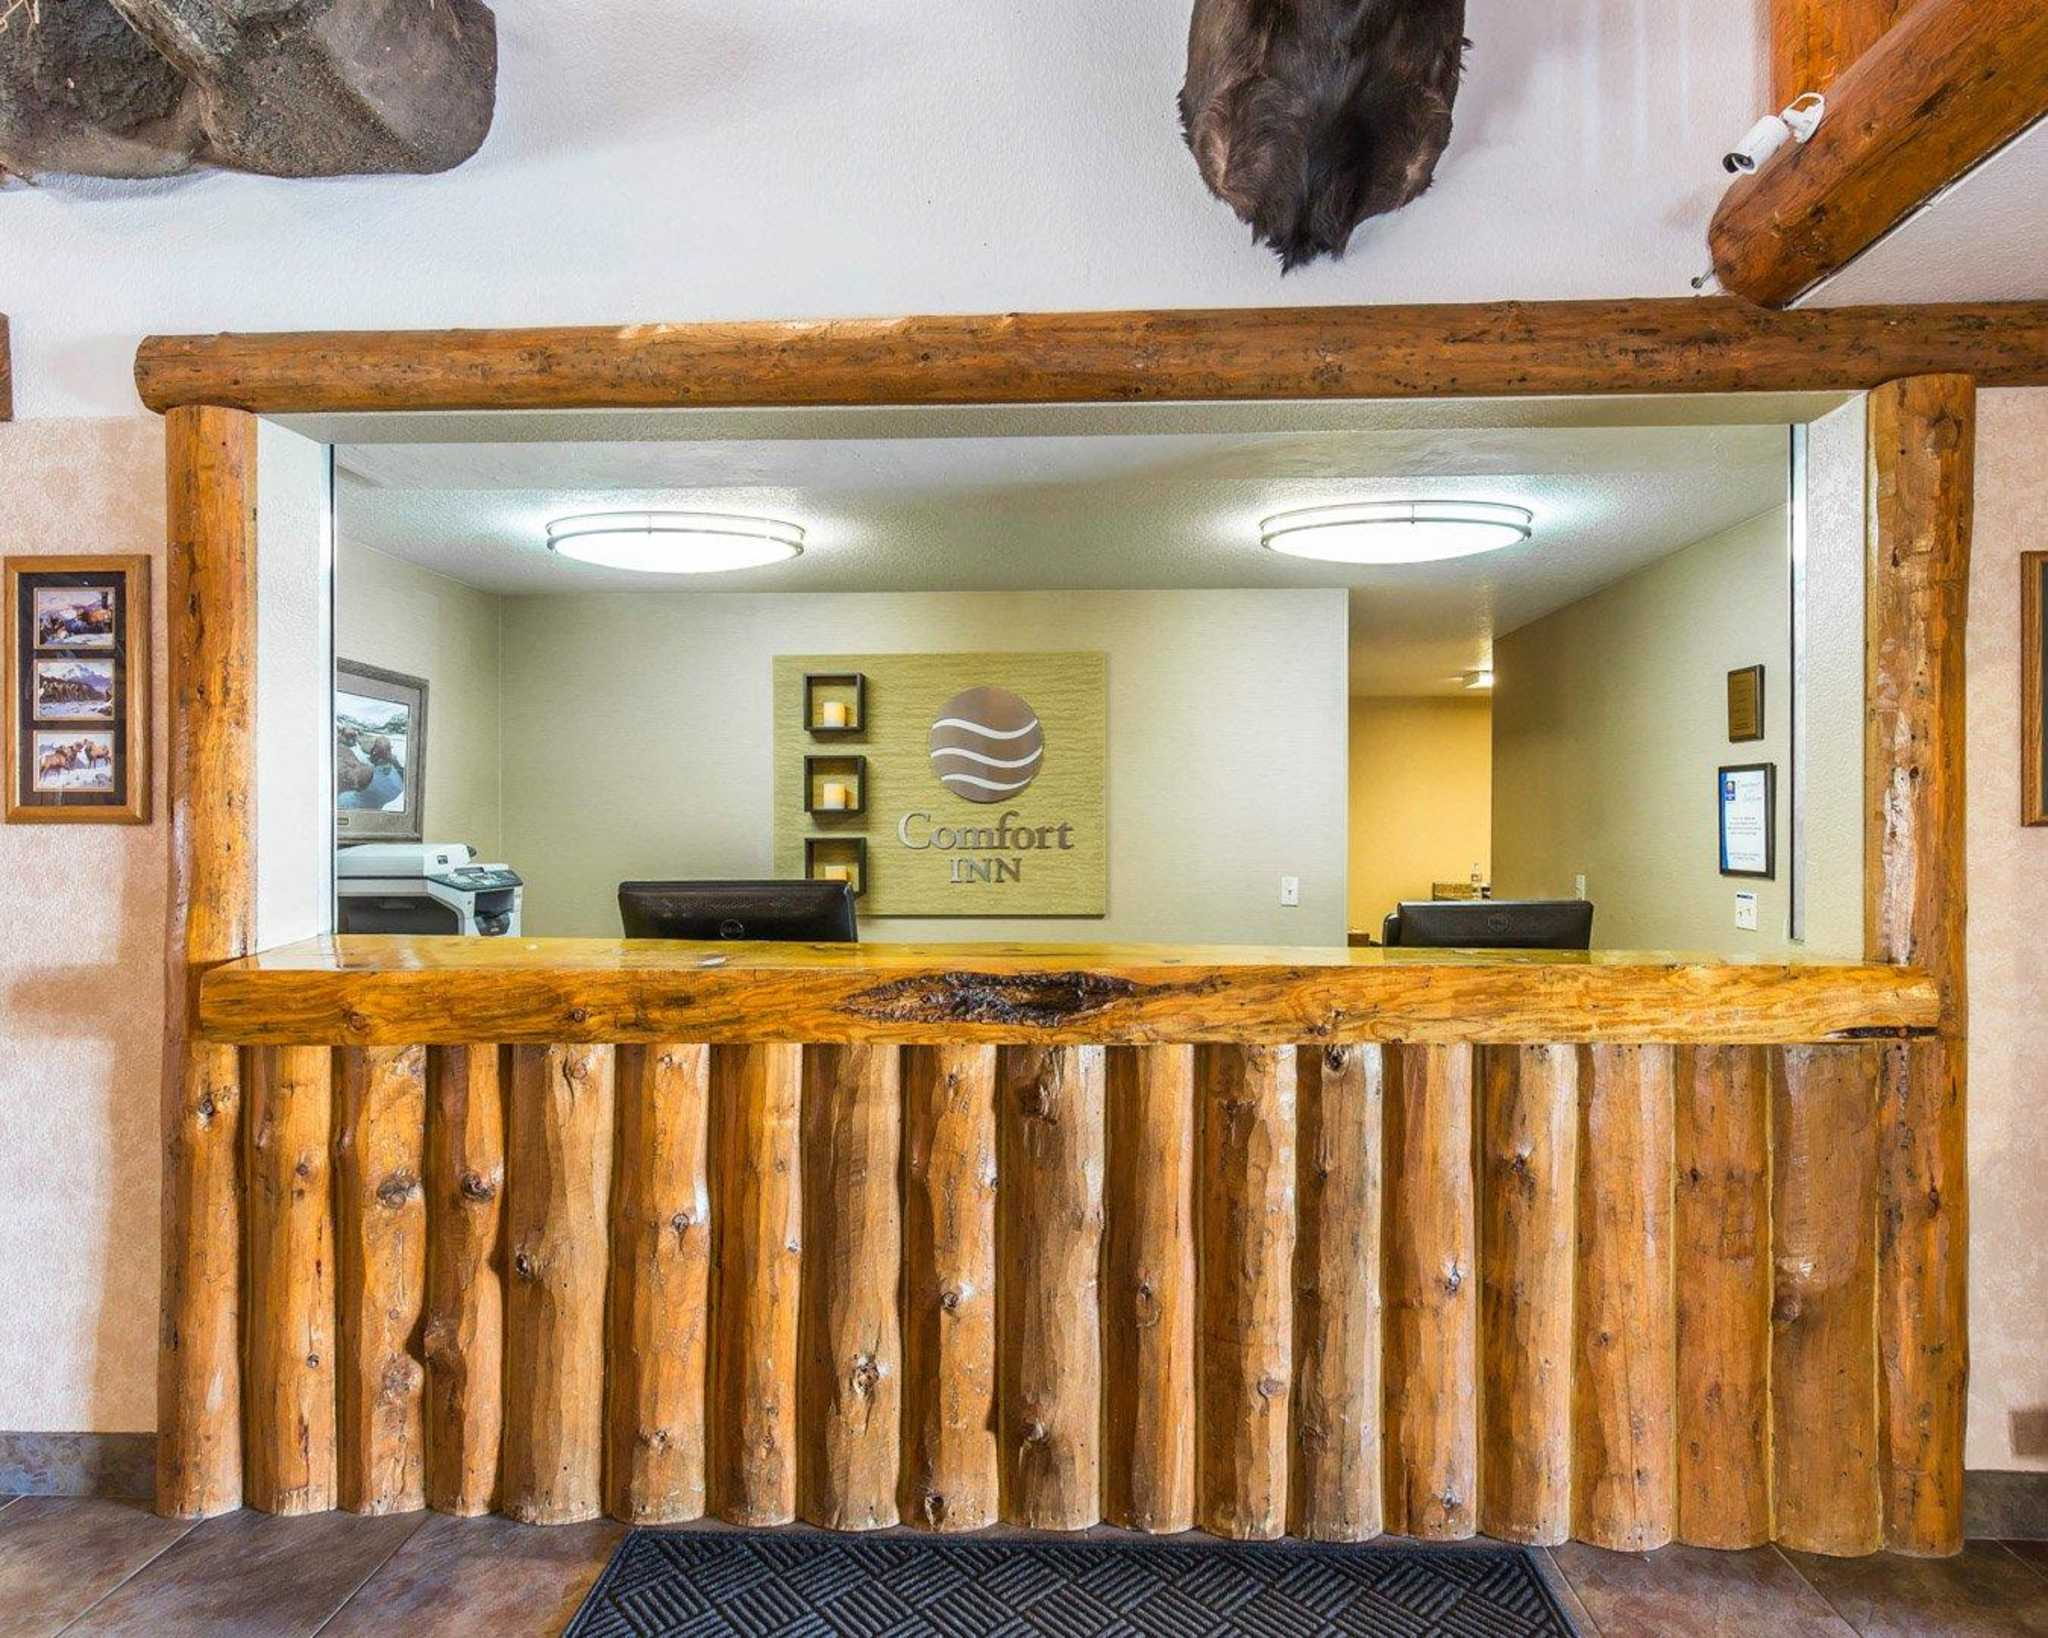 Comfort Inn Yellowstone North image 35